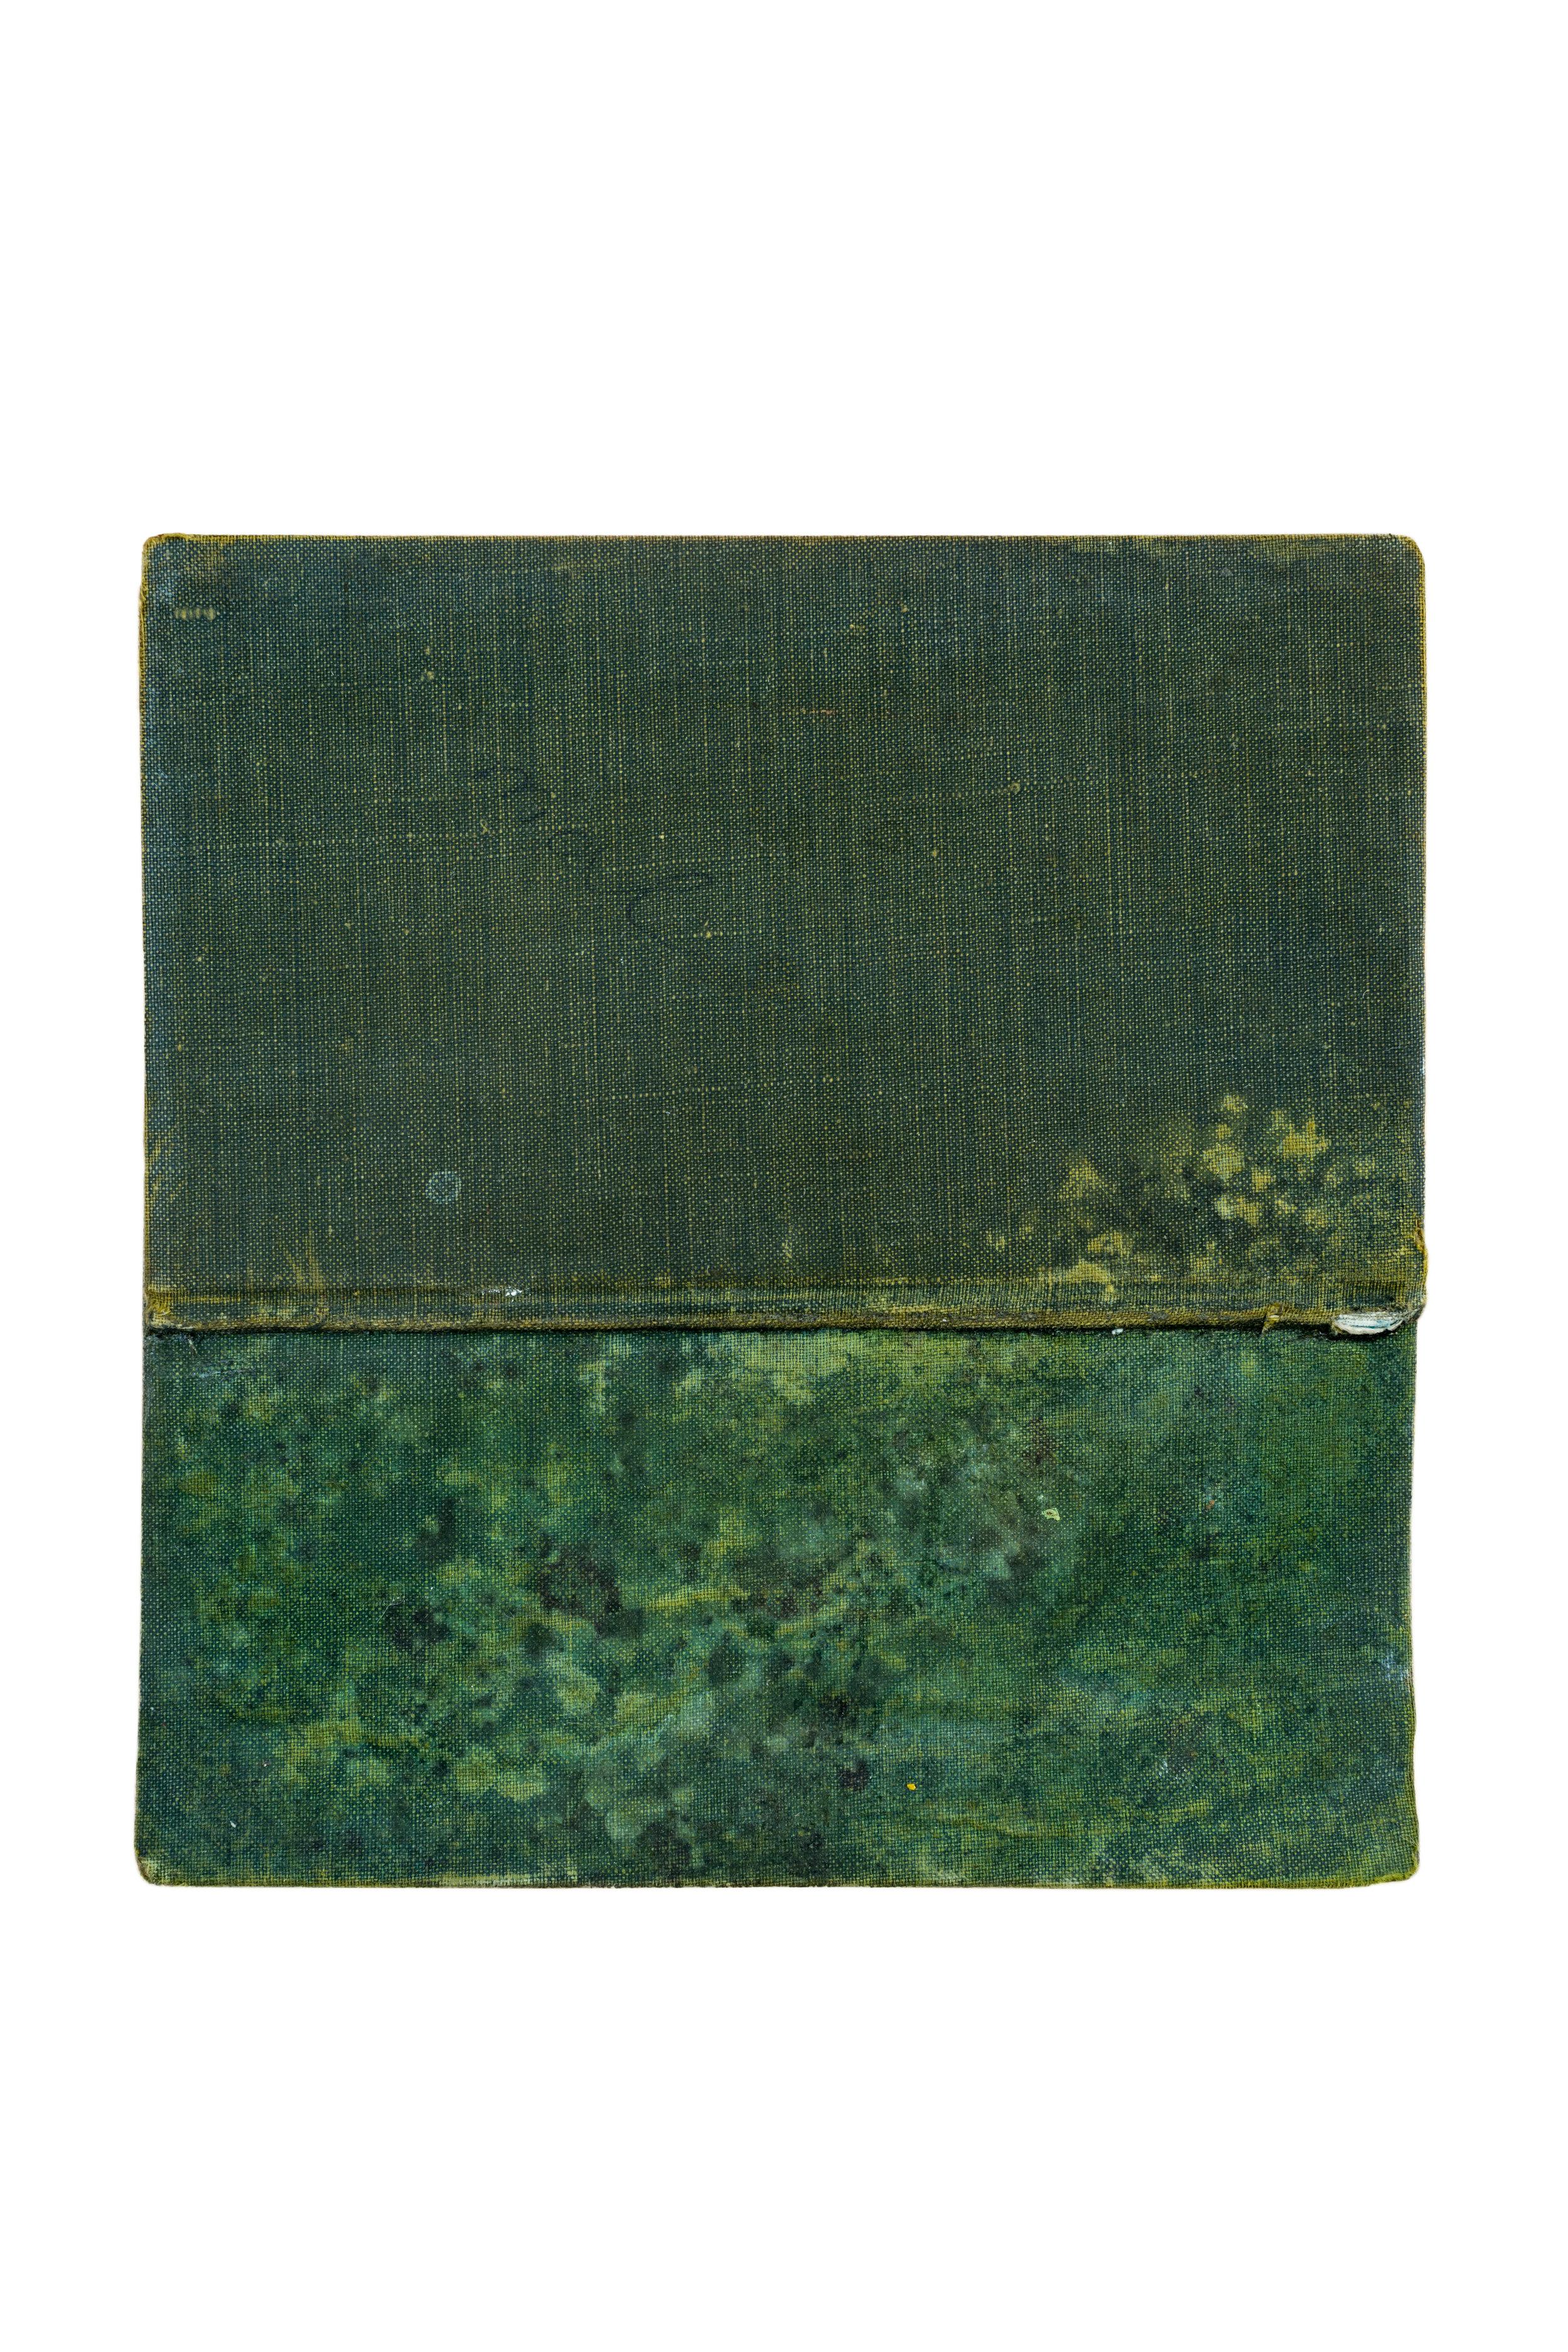 VV  Técnica: Mixta sobre carátula de libro  Medida:16 x 15 cm  Año: 2015